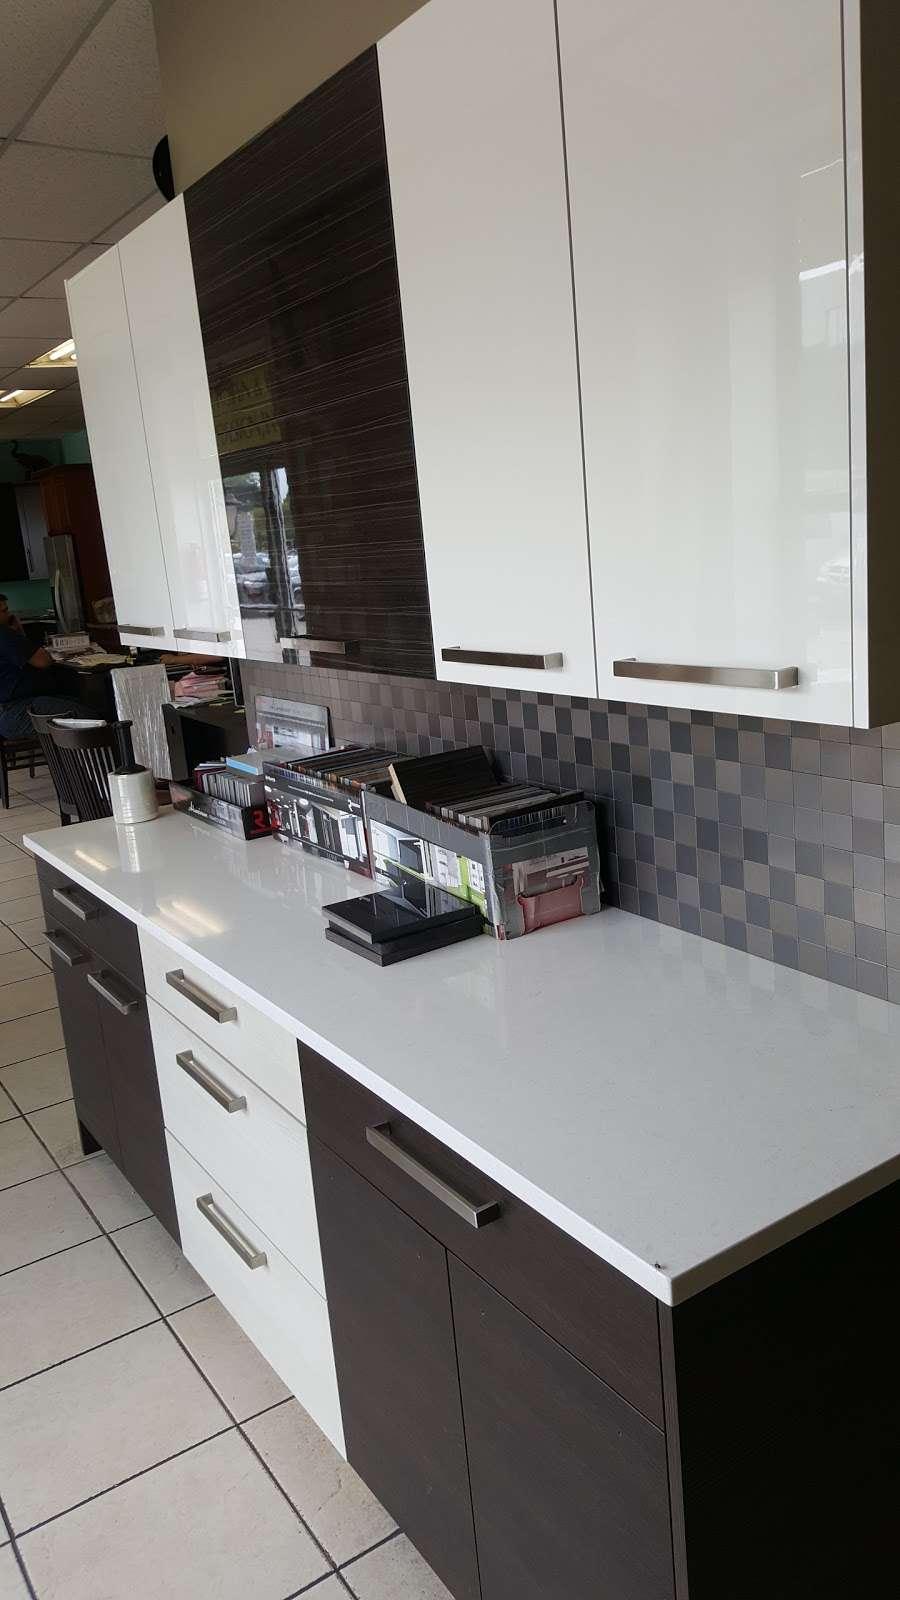 Kitchen Bath Design 2225 W North Ave Melrose Park Il 60160 Usa